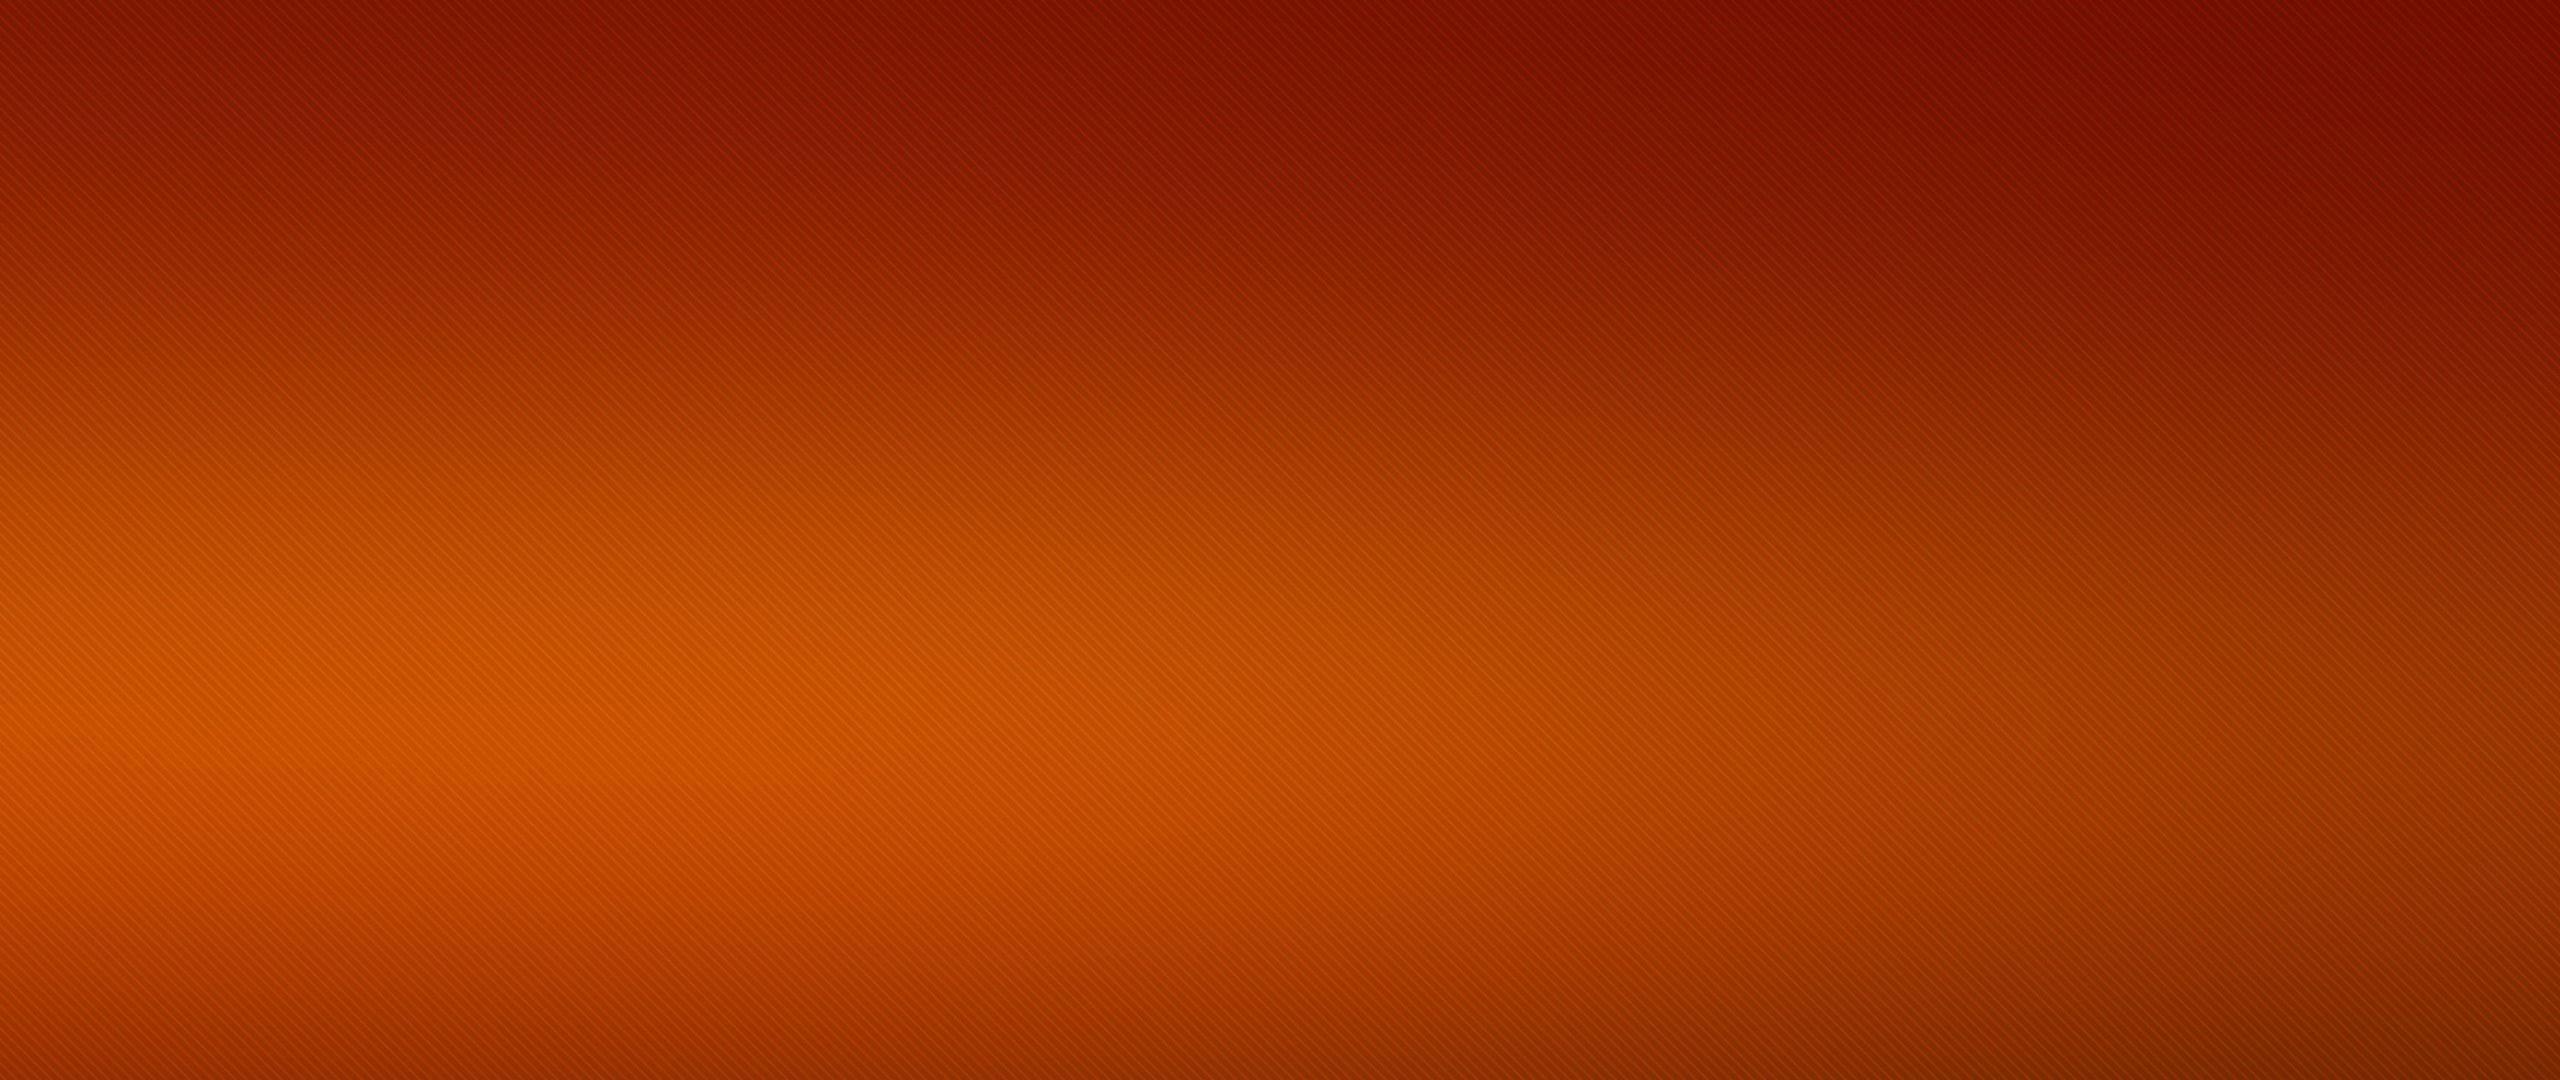 Solid Desktop Backgrounds 2120x1192